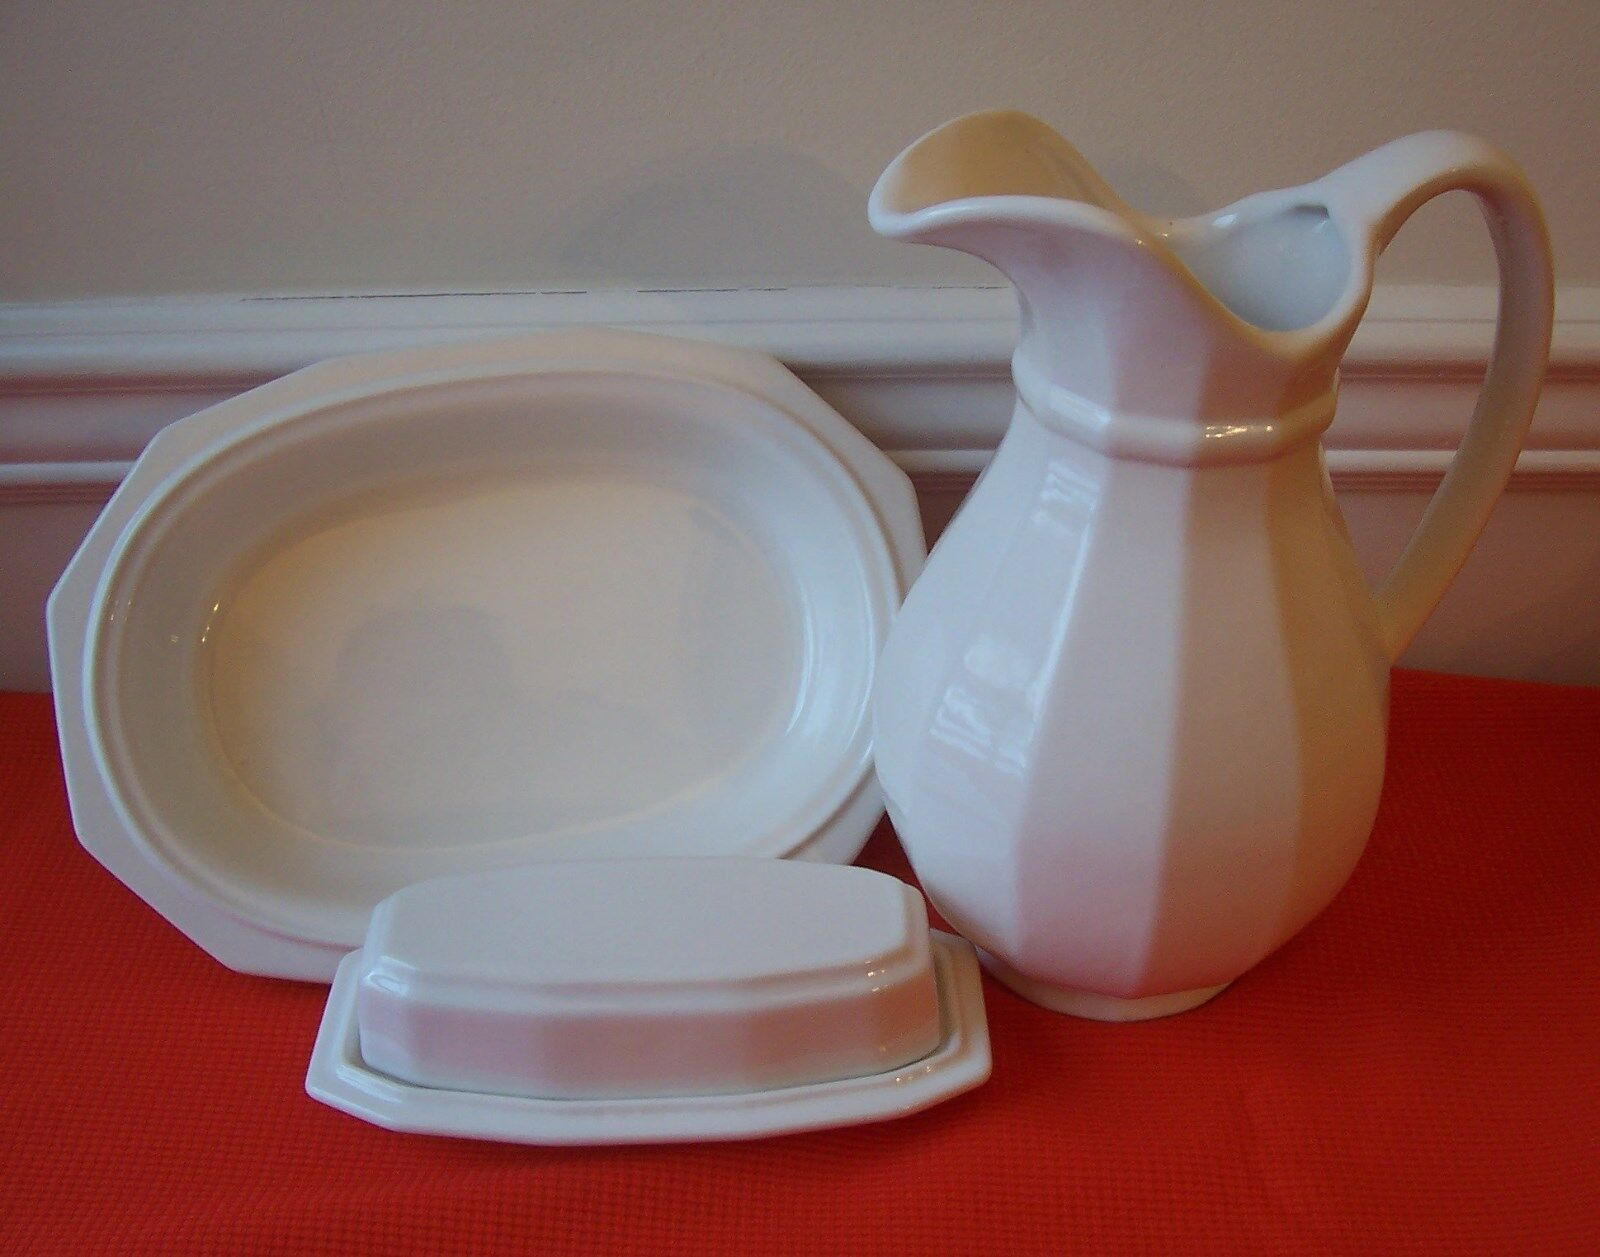 Pfaltzgraff Heritage White Covered Butter Dish | eBay